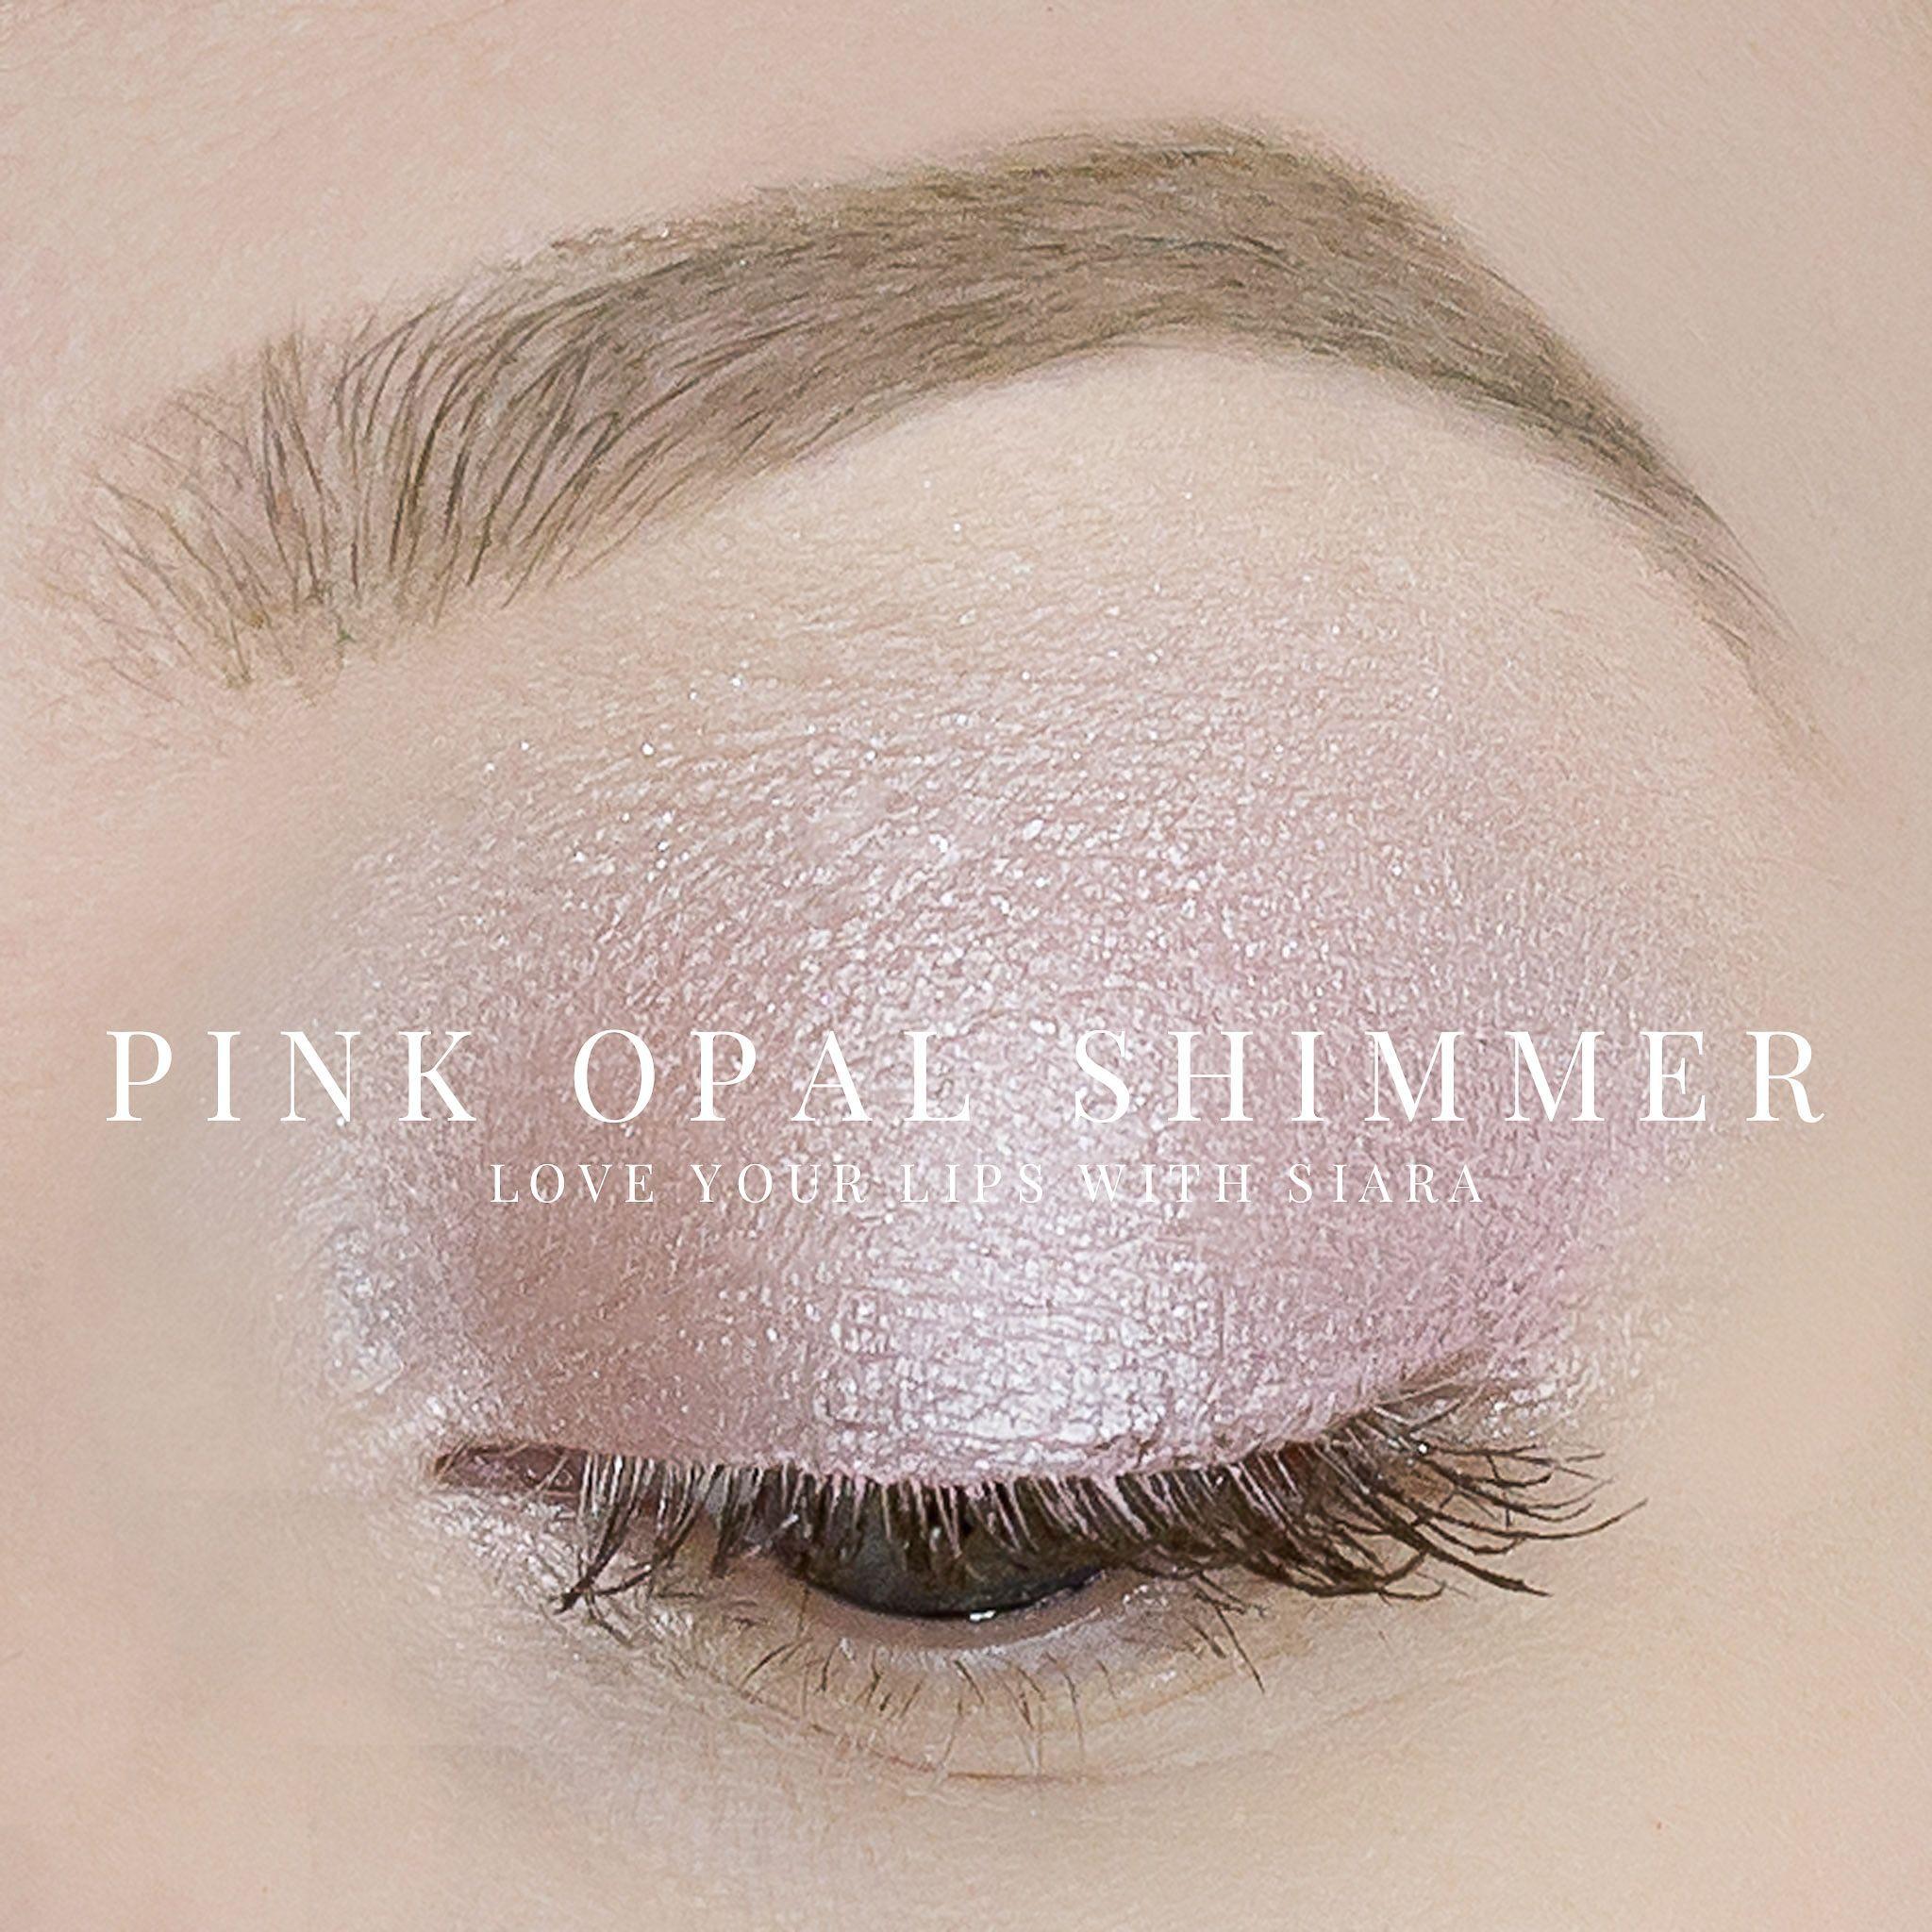 Pink Opal Shimmer ShadowSense by SeneGence Pink Opal Shimmer ShadowSense by SeneGence Melanie West melaniebrashier Senegence Pink Opal Shimmer ShadowSense by SeneGence